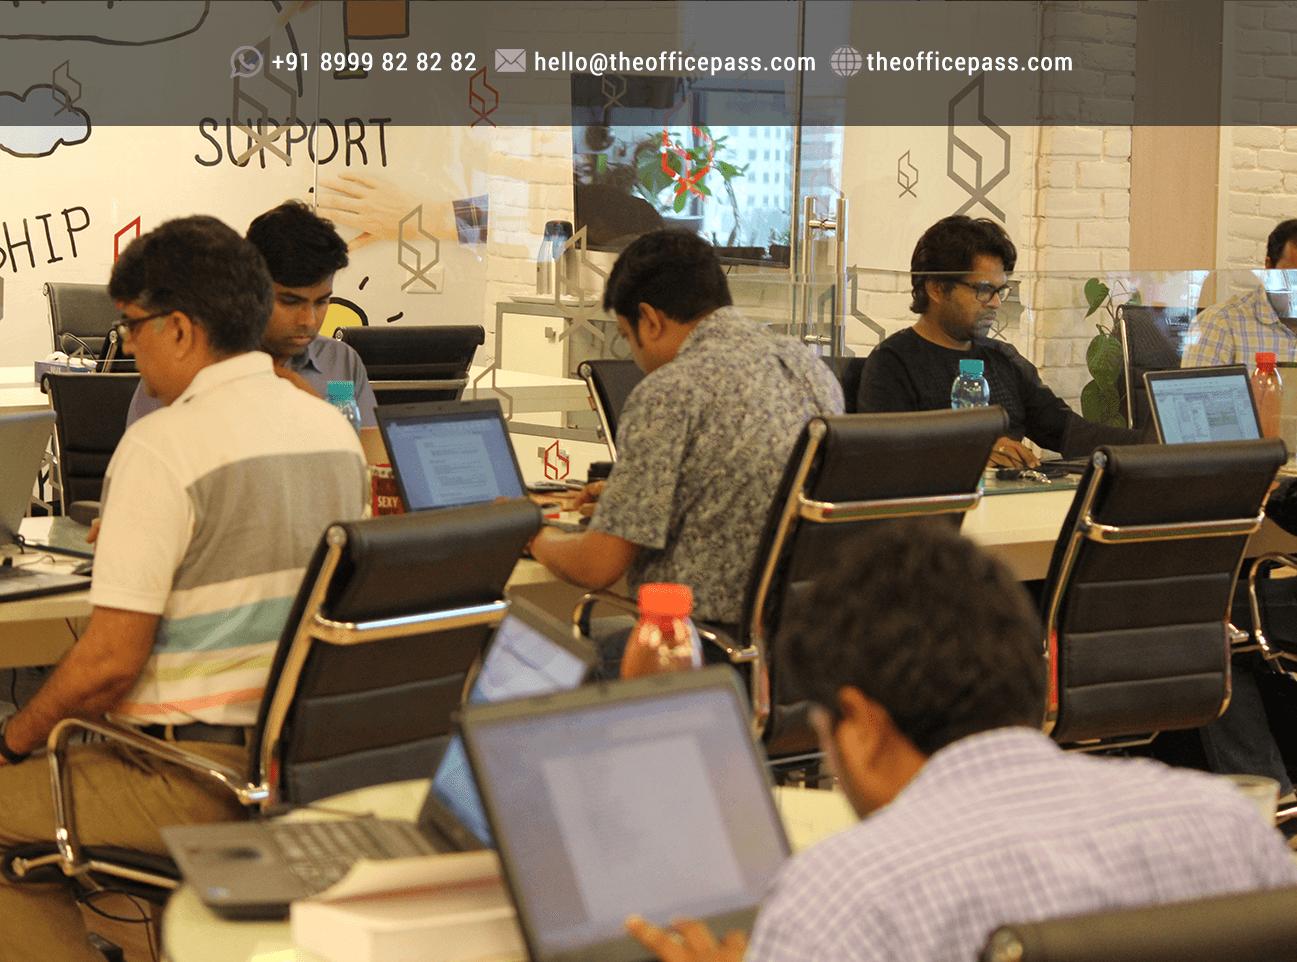 Freelancring taking shape The Office Pass in Gurgaon